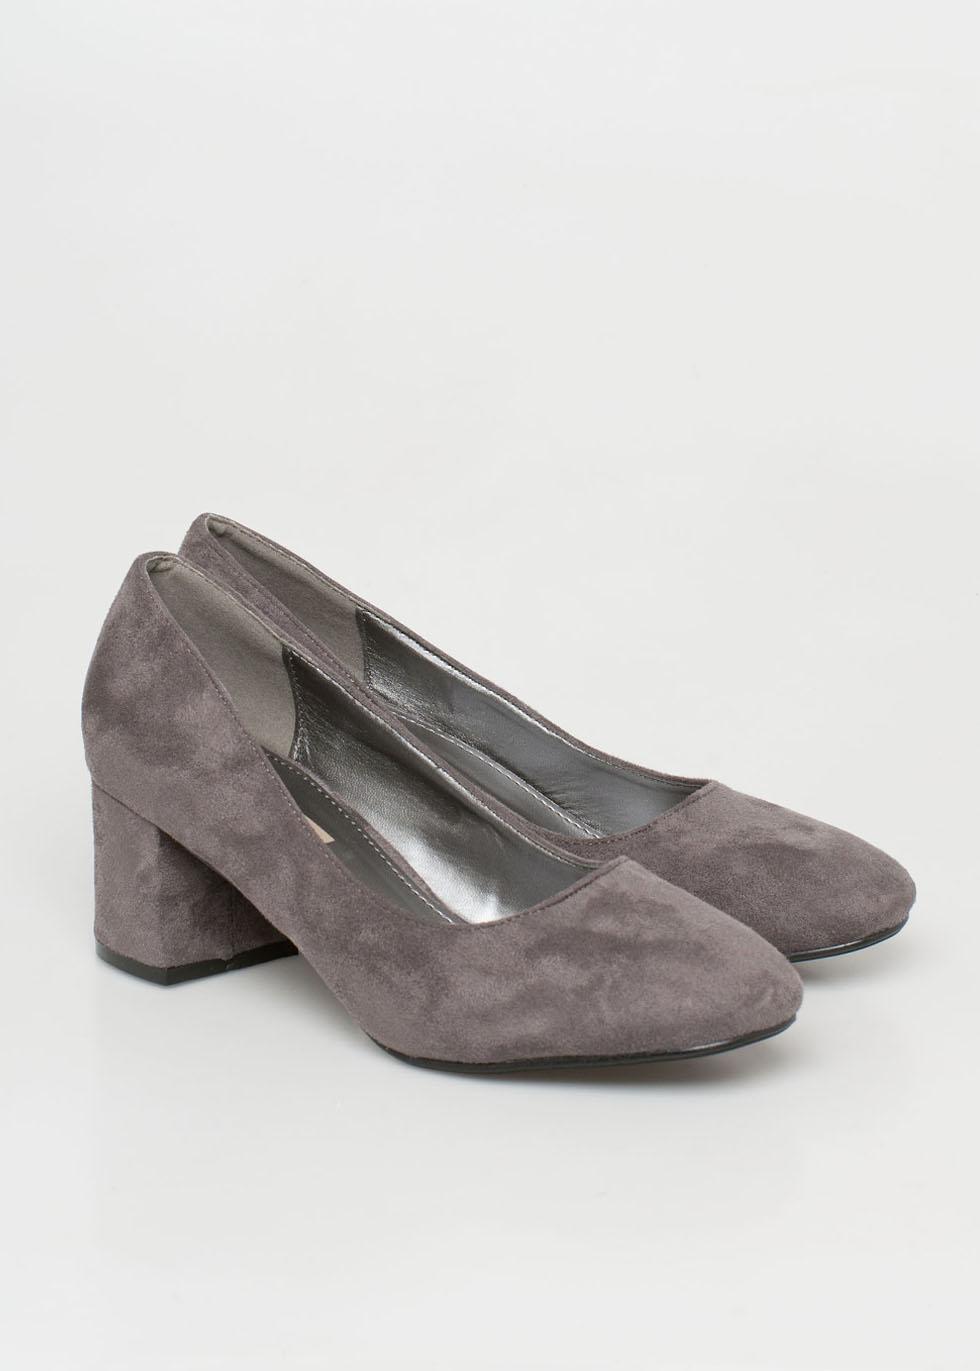 5bf15f88394 Γυναικείες Γόβες-Peep Toes - Φθηνότερα Προϊόντα - Σελίδα 50   Outfit.gr